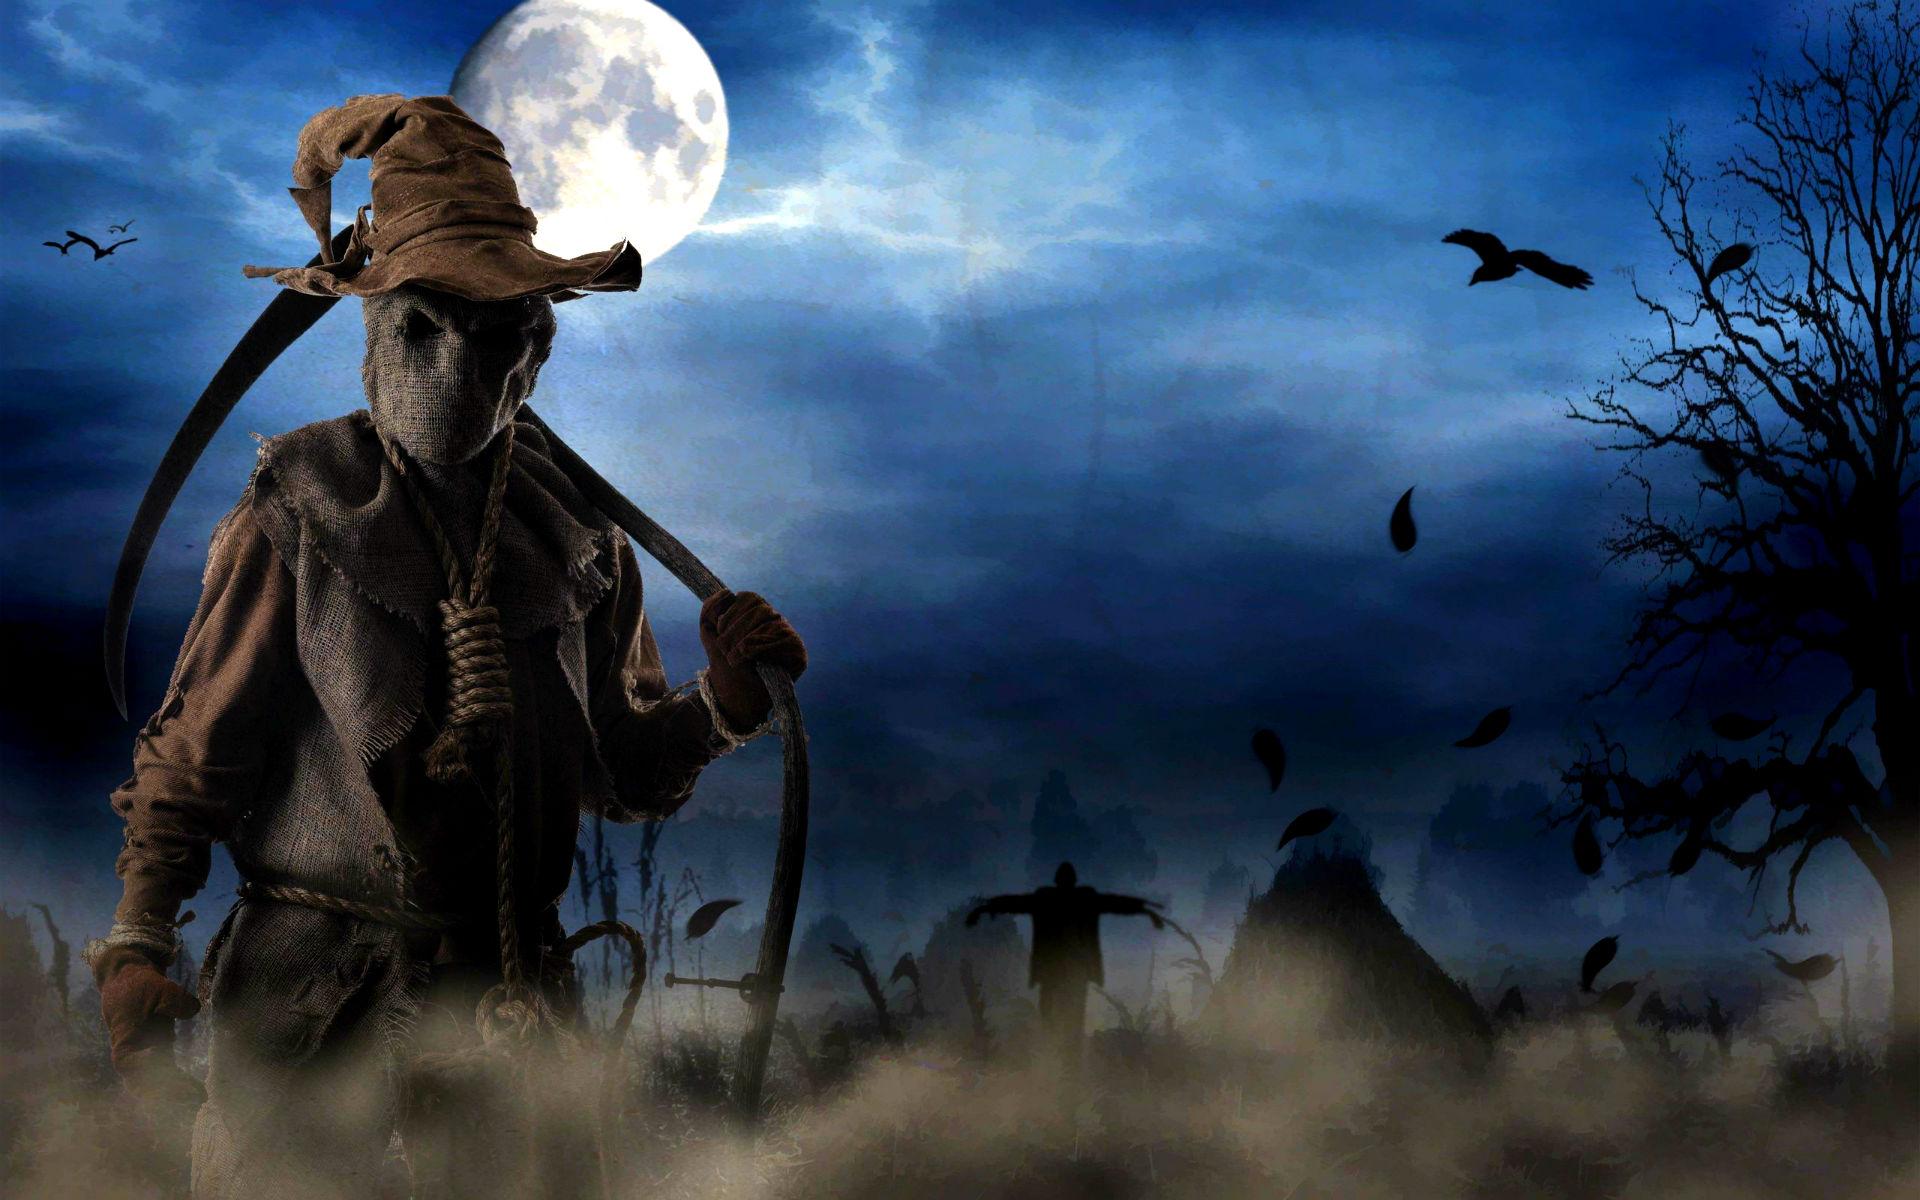 Download Free Hd Horror Wallpapers: Creepy Halloween Wallpapers For Desktop